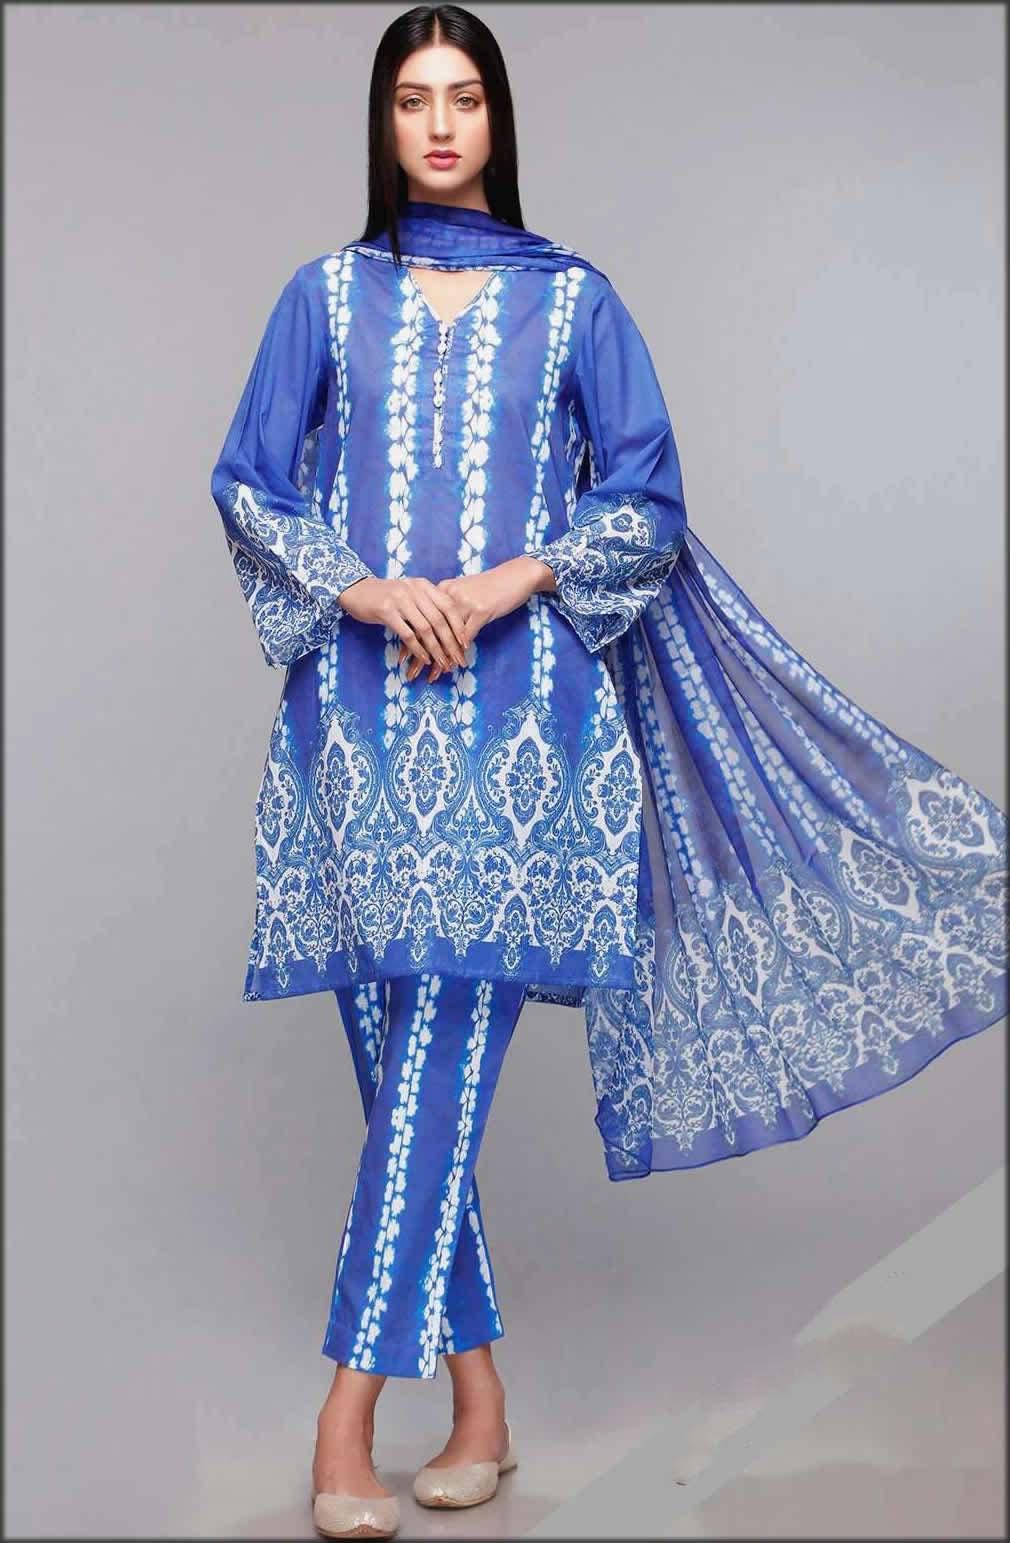 Ustitched Printed Lawn Shirt And Dupatta Rang Ja Summer Collection